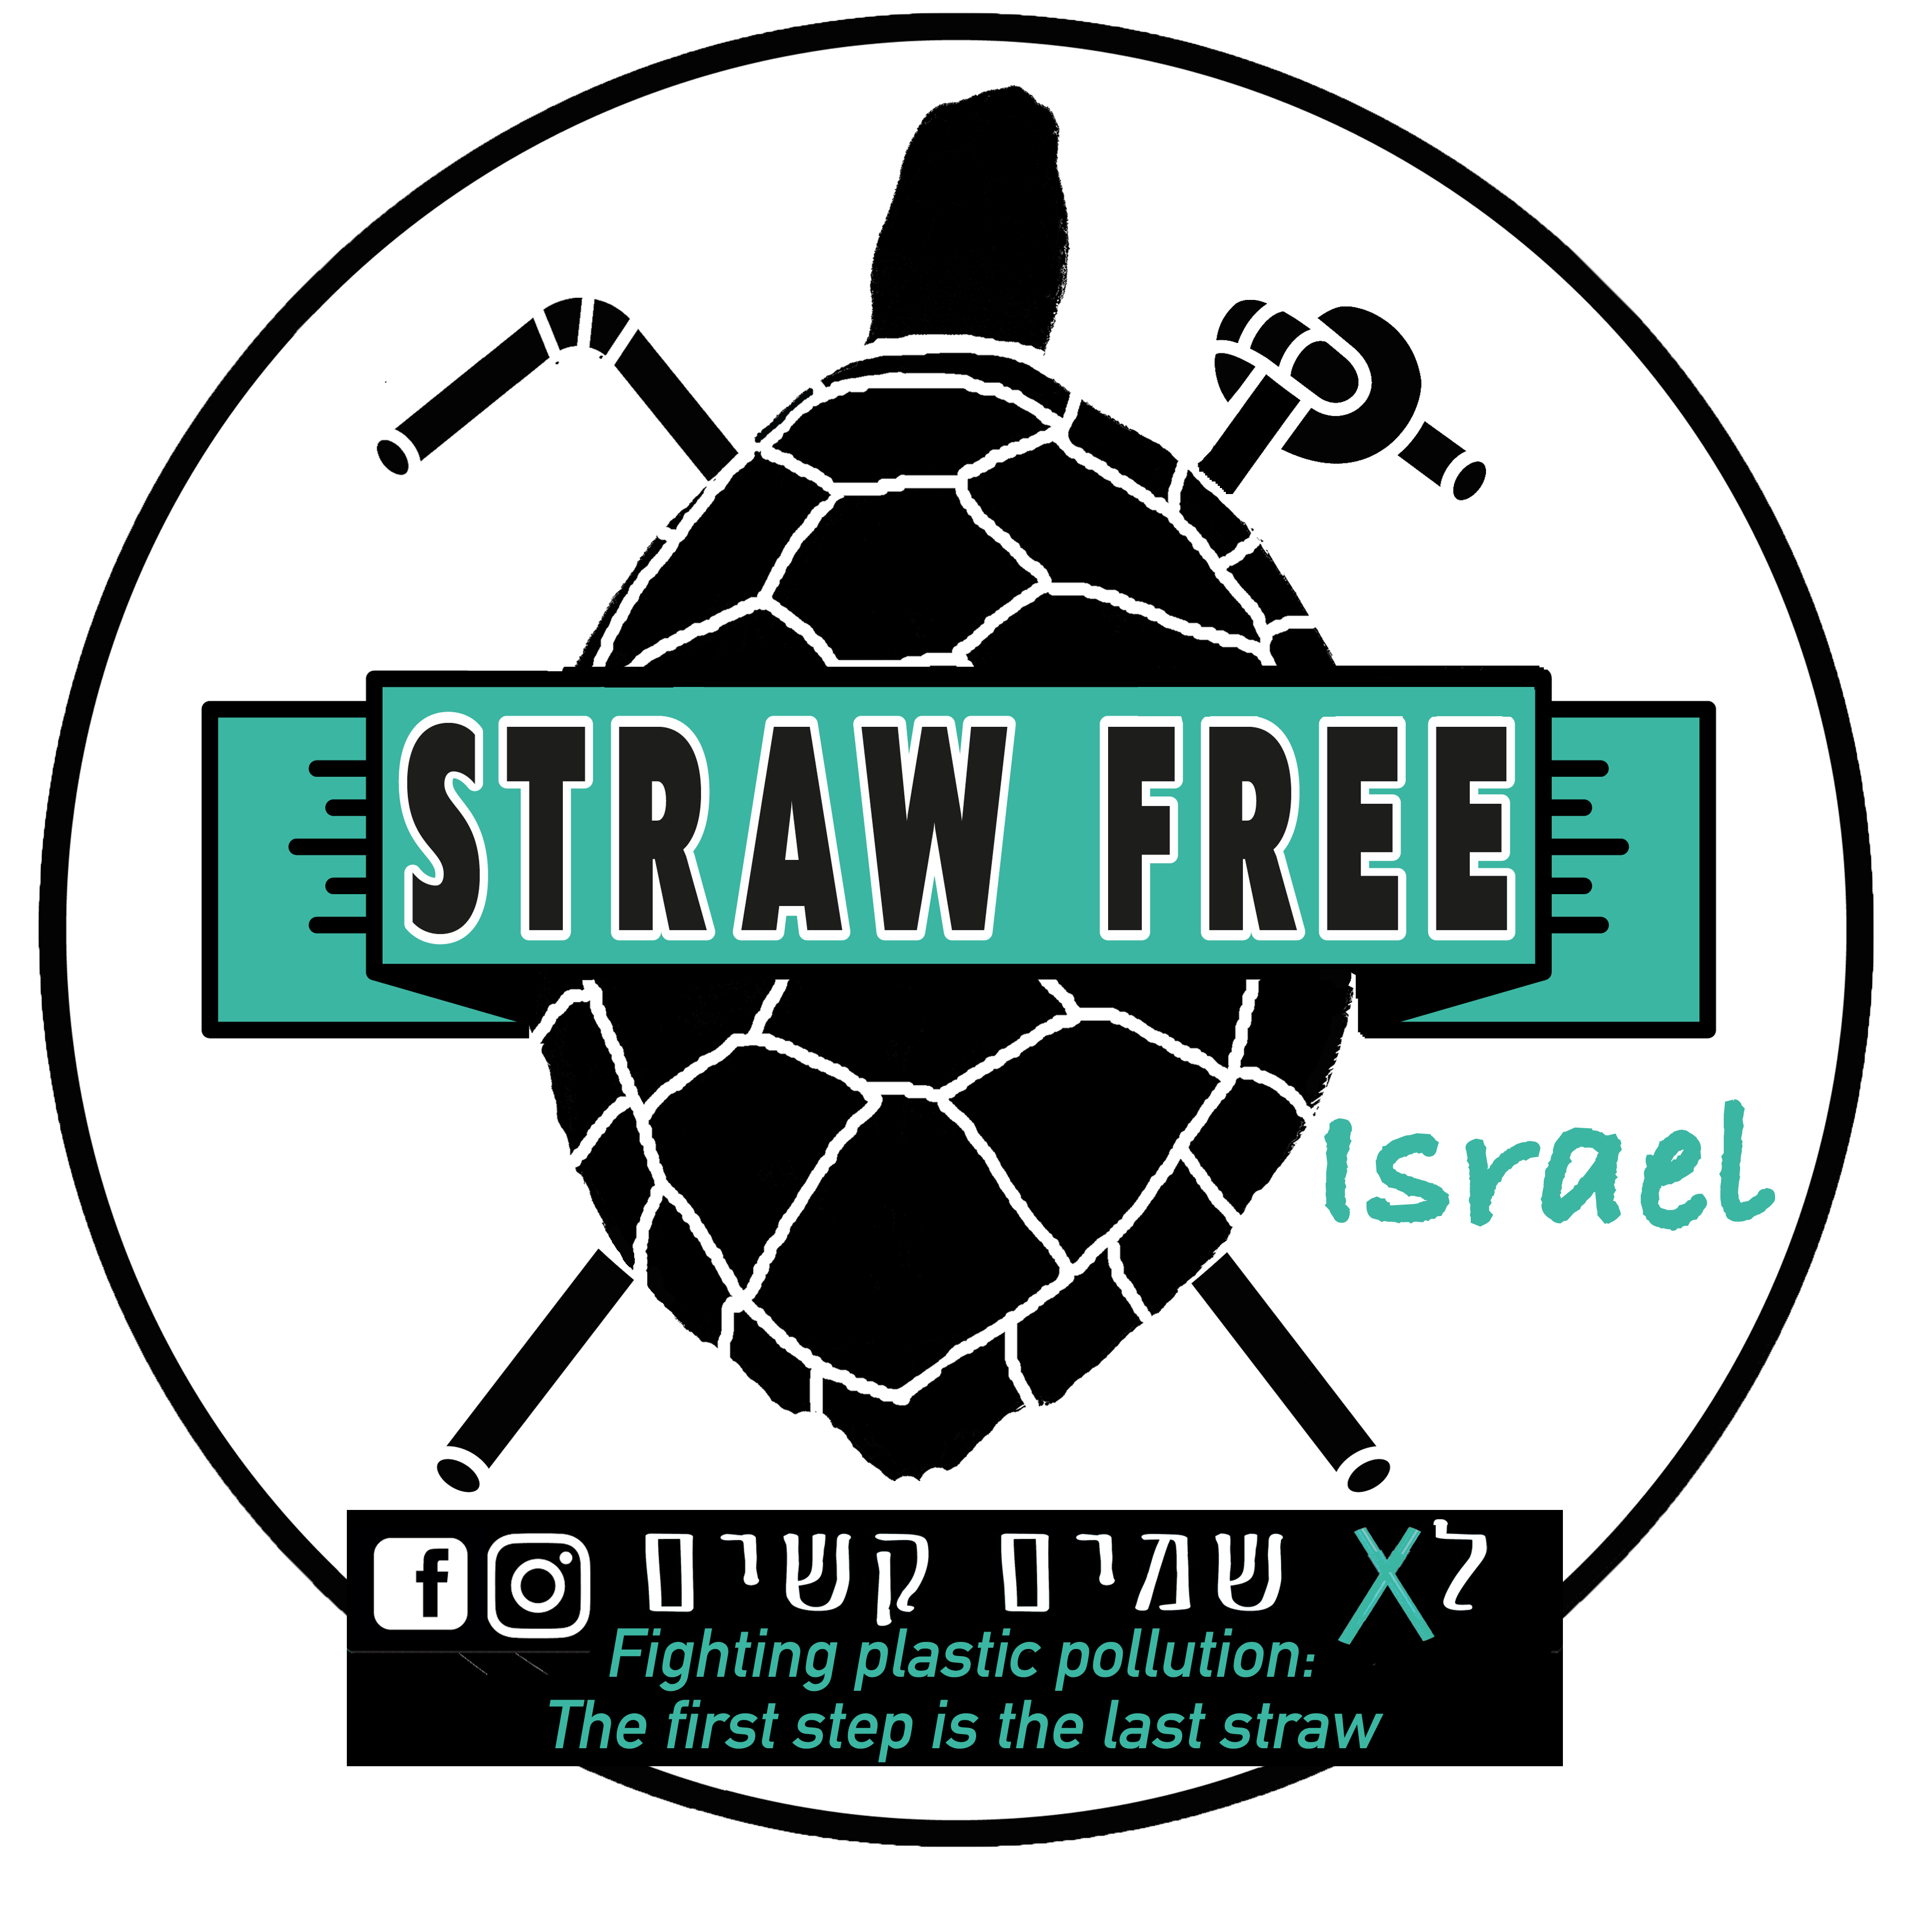 Straw_Free_Israel_Logo_motto_Nov_18